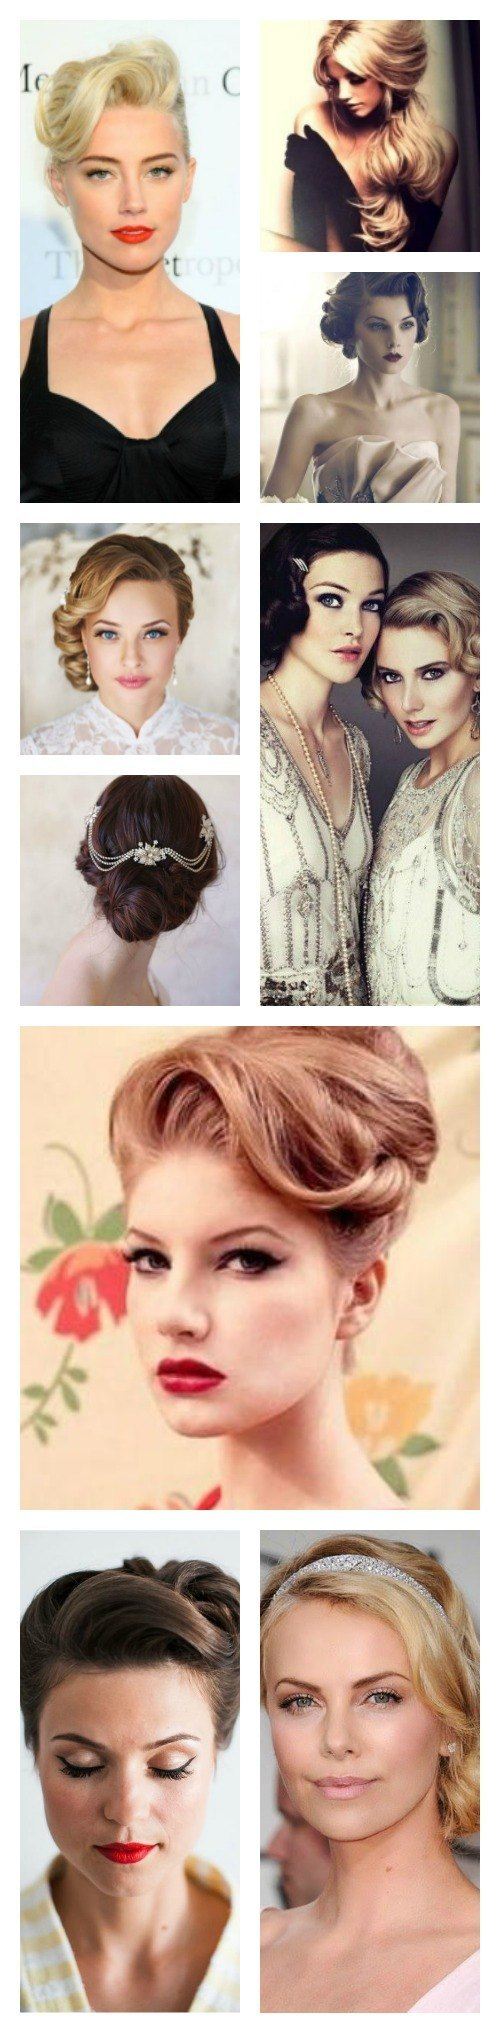 peinados vintage para bodas